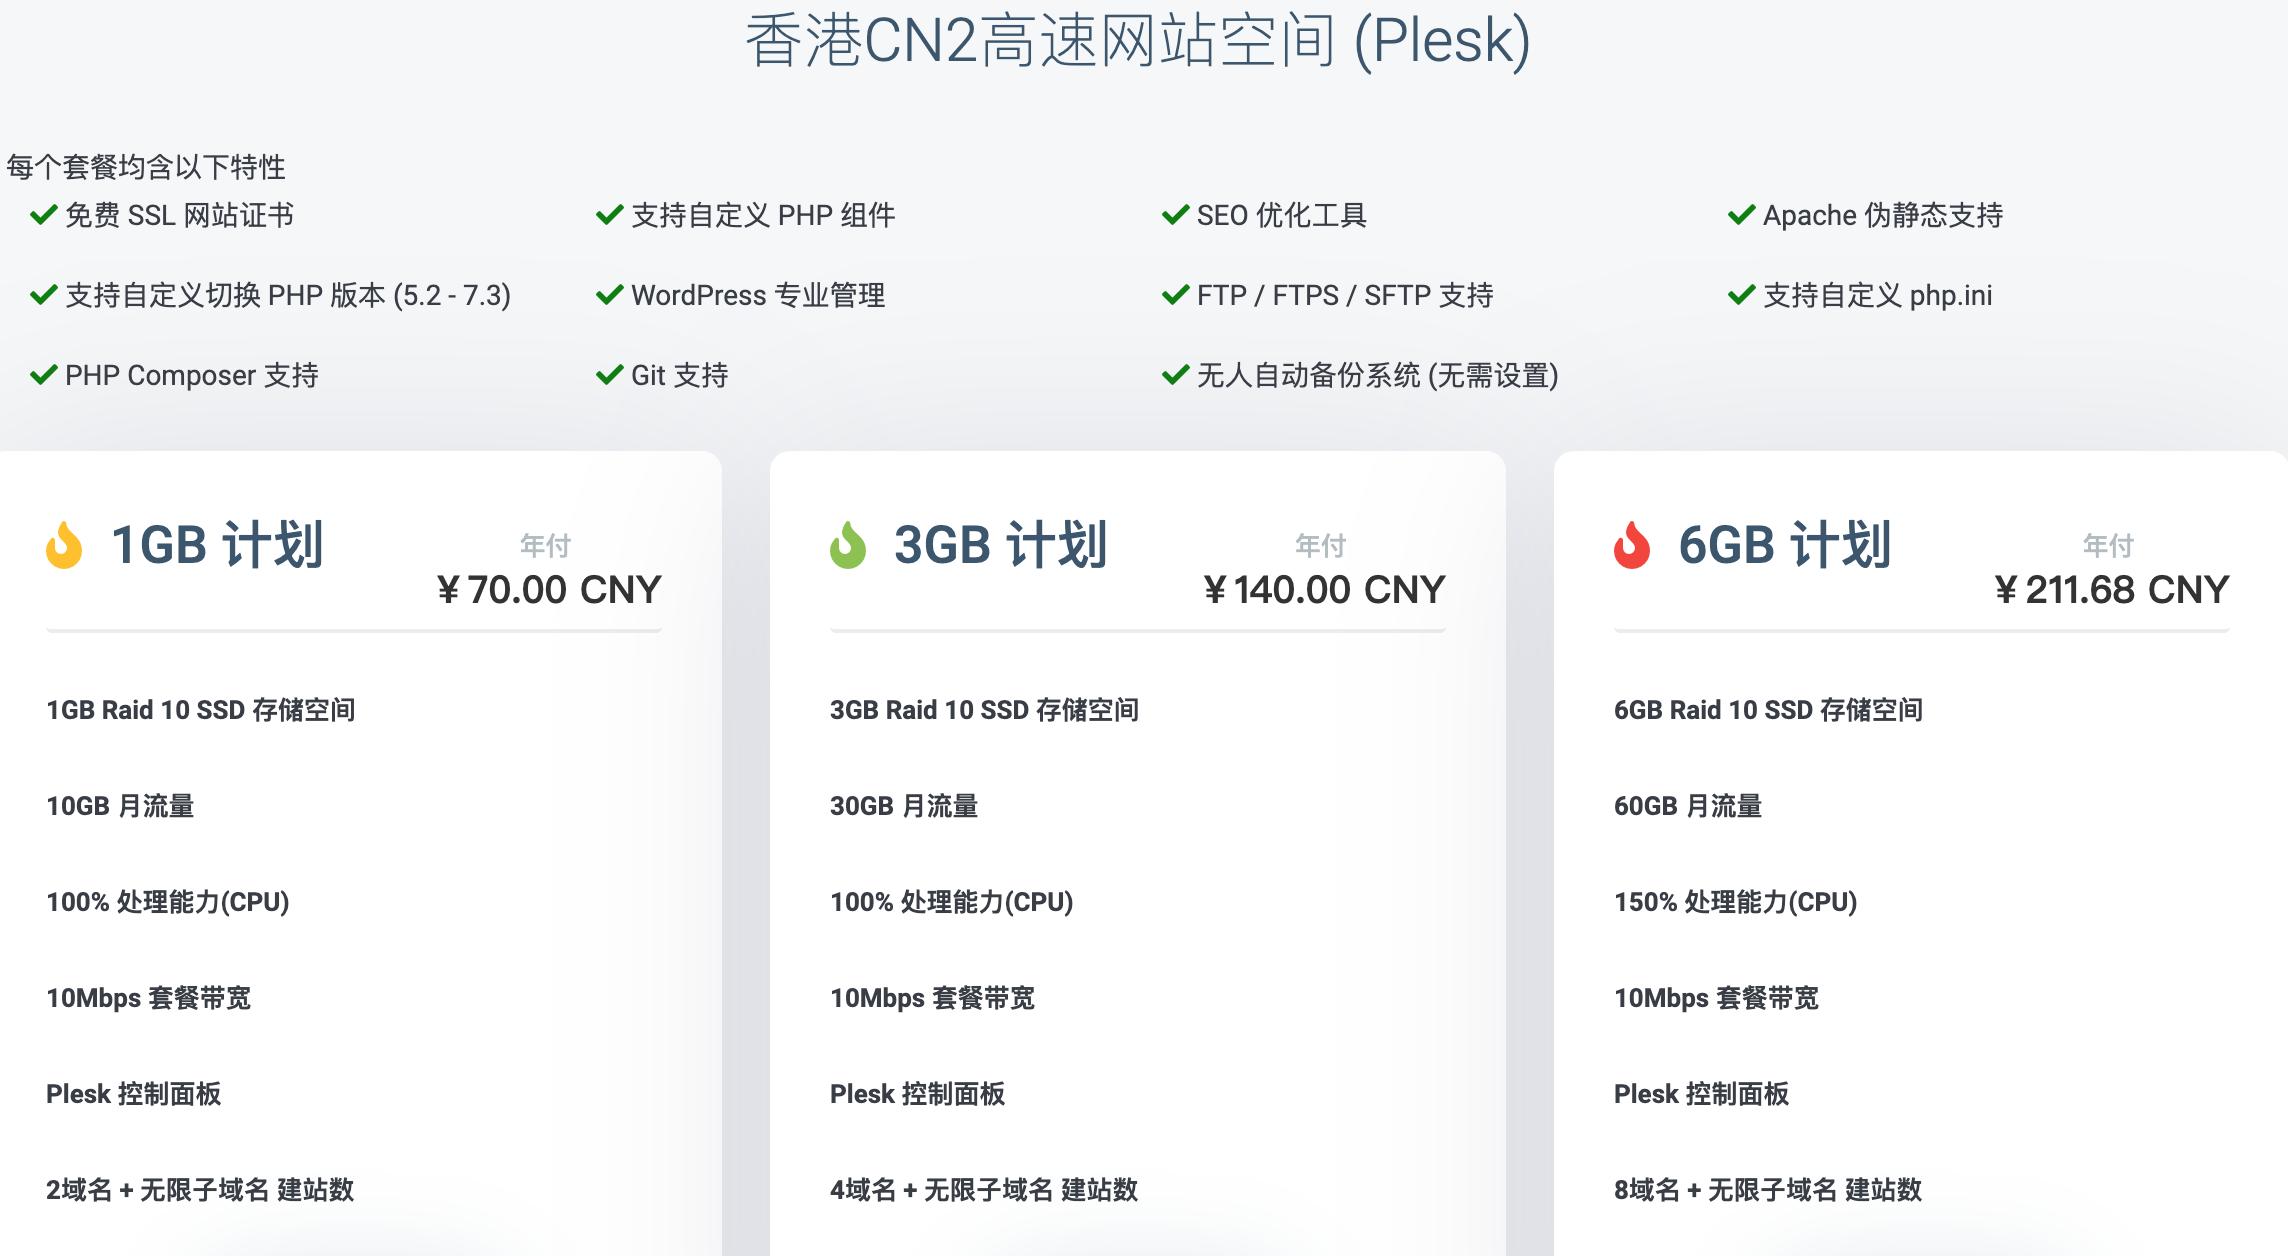 wikihost的Linux PHP香港主机虚拟空间1G/3G/6G,香港/美国/日本/韩国VPS